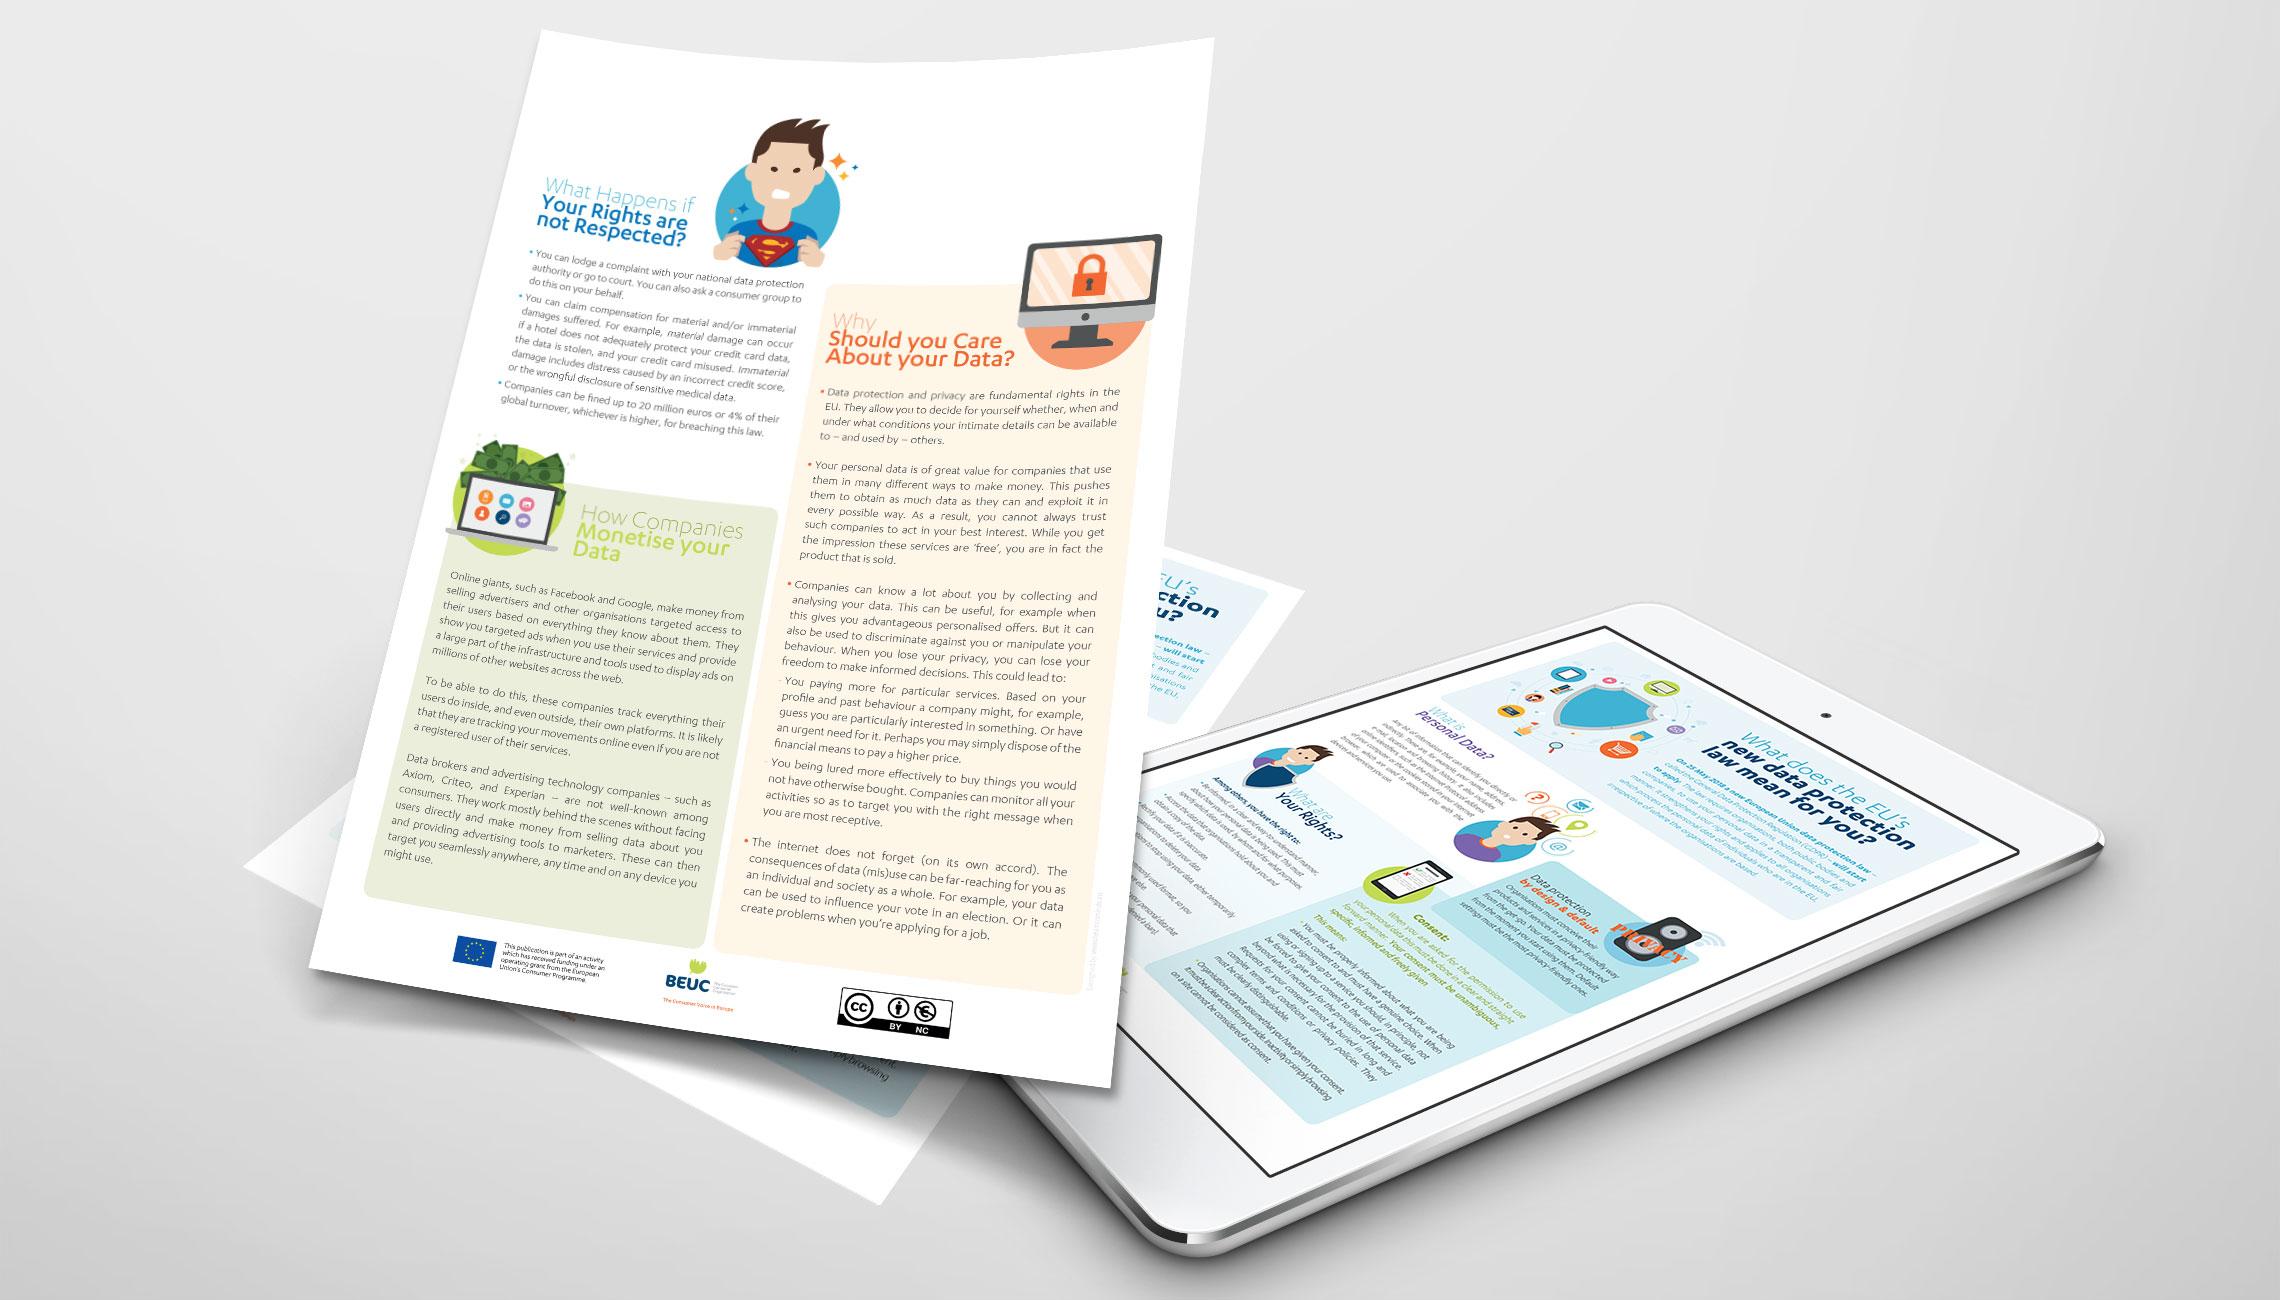 campaign: BEUC mini-campaign on the basics of GDPR  - image 2